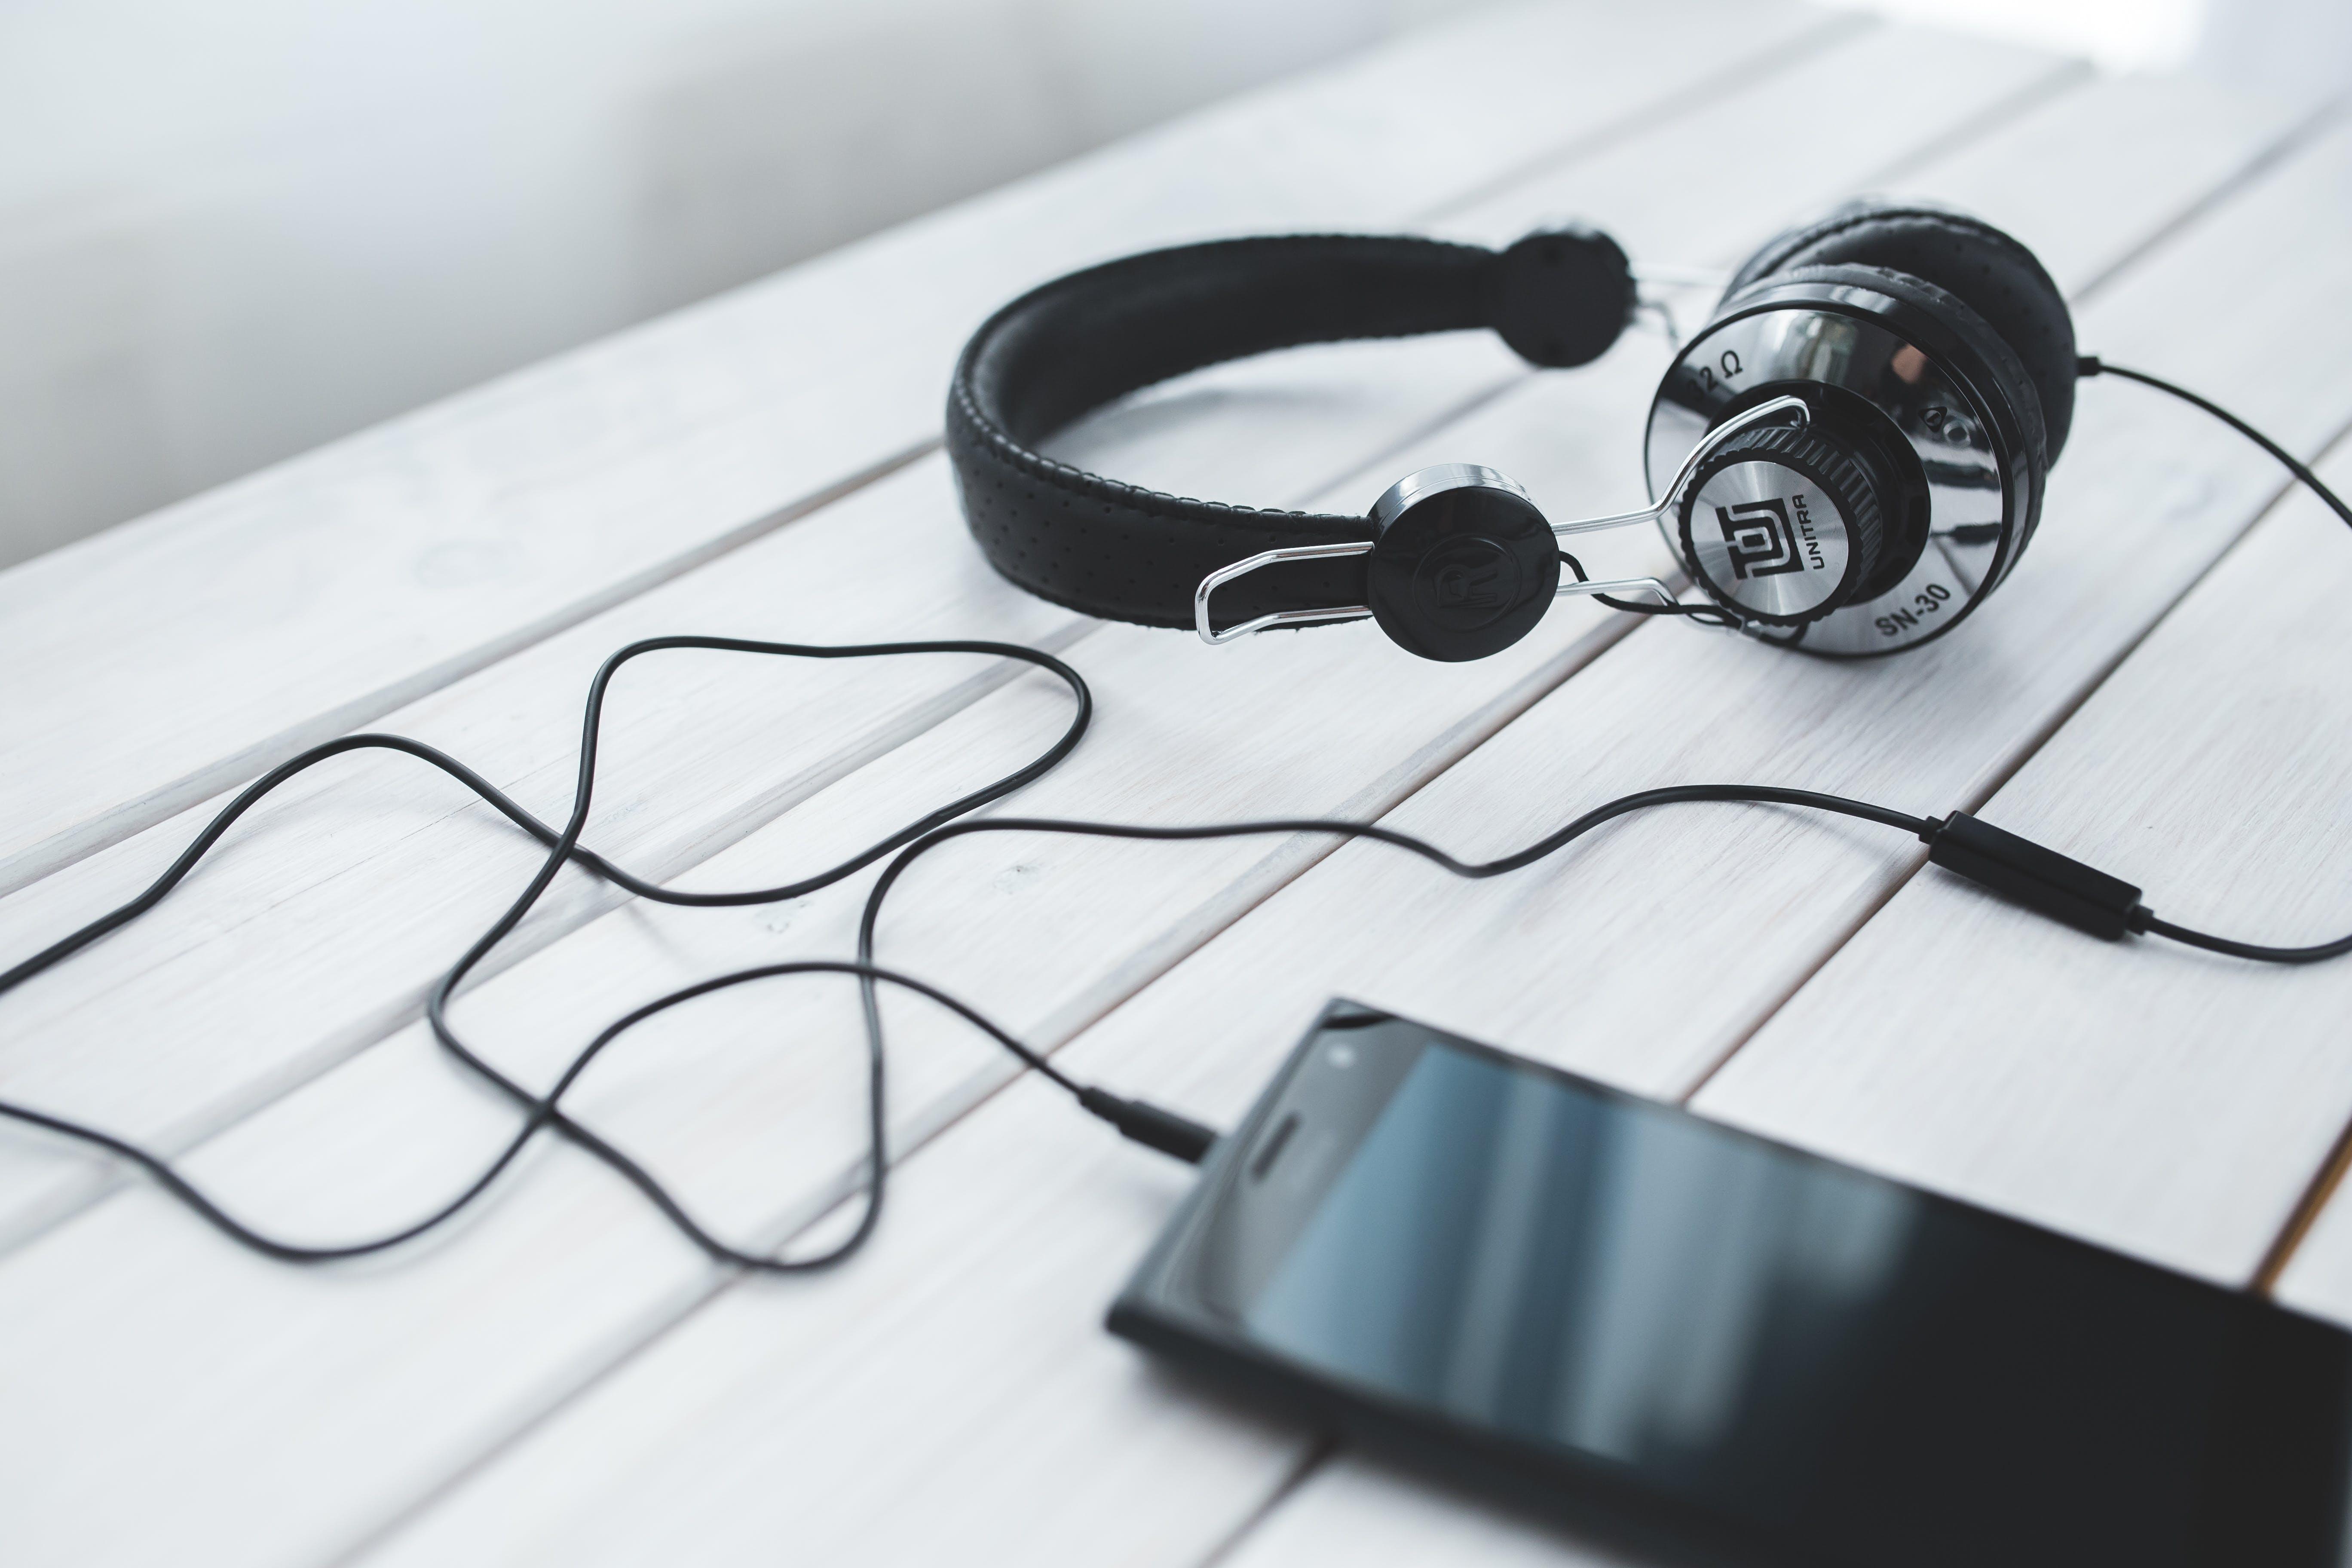 Black vintage headphones with mobile smartphone